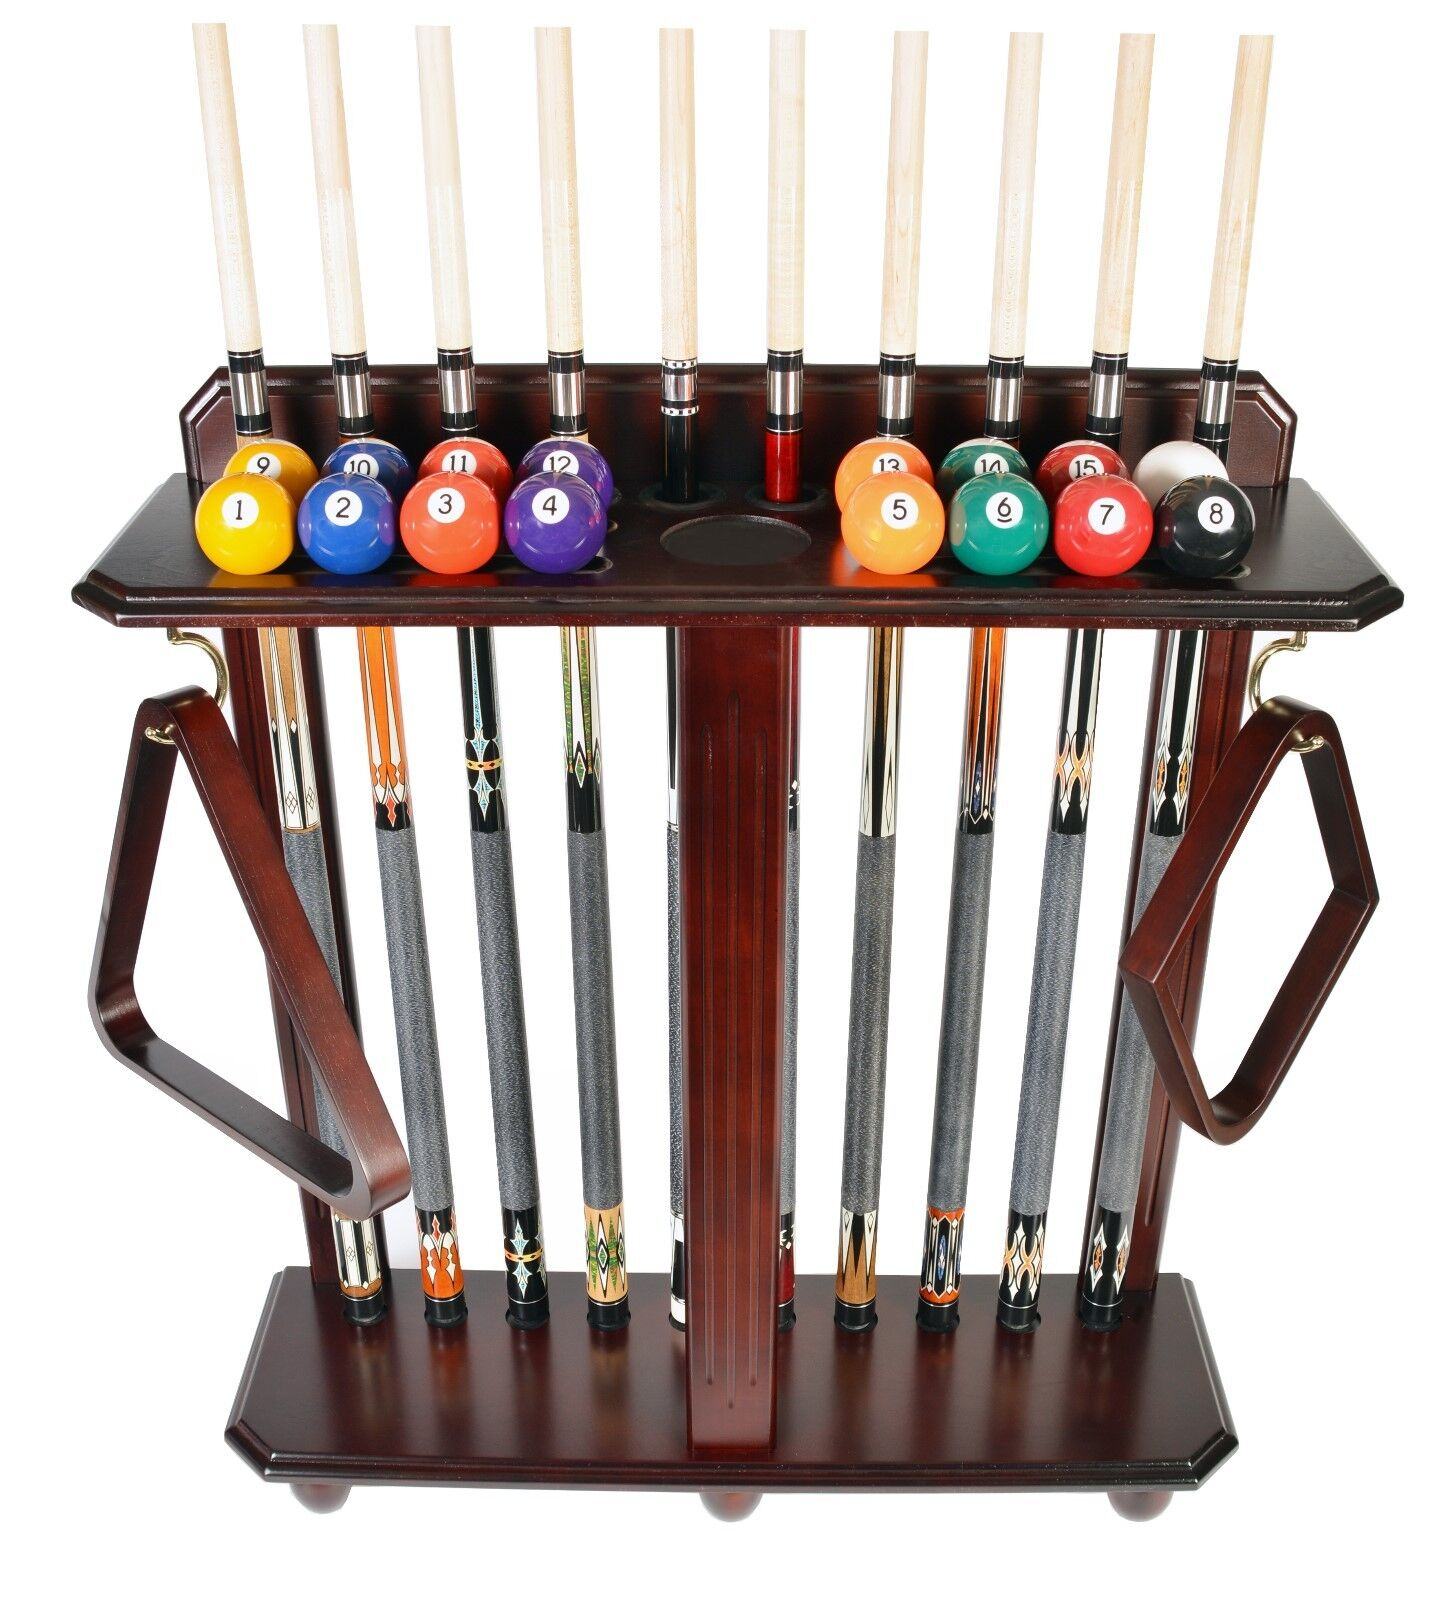 Cue Rack Only Iszy Billiards Billiard Stick /& Ball Set Floor Rack 10 Pool